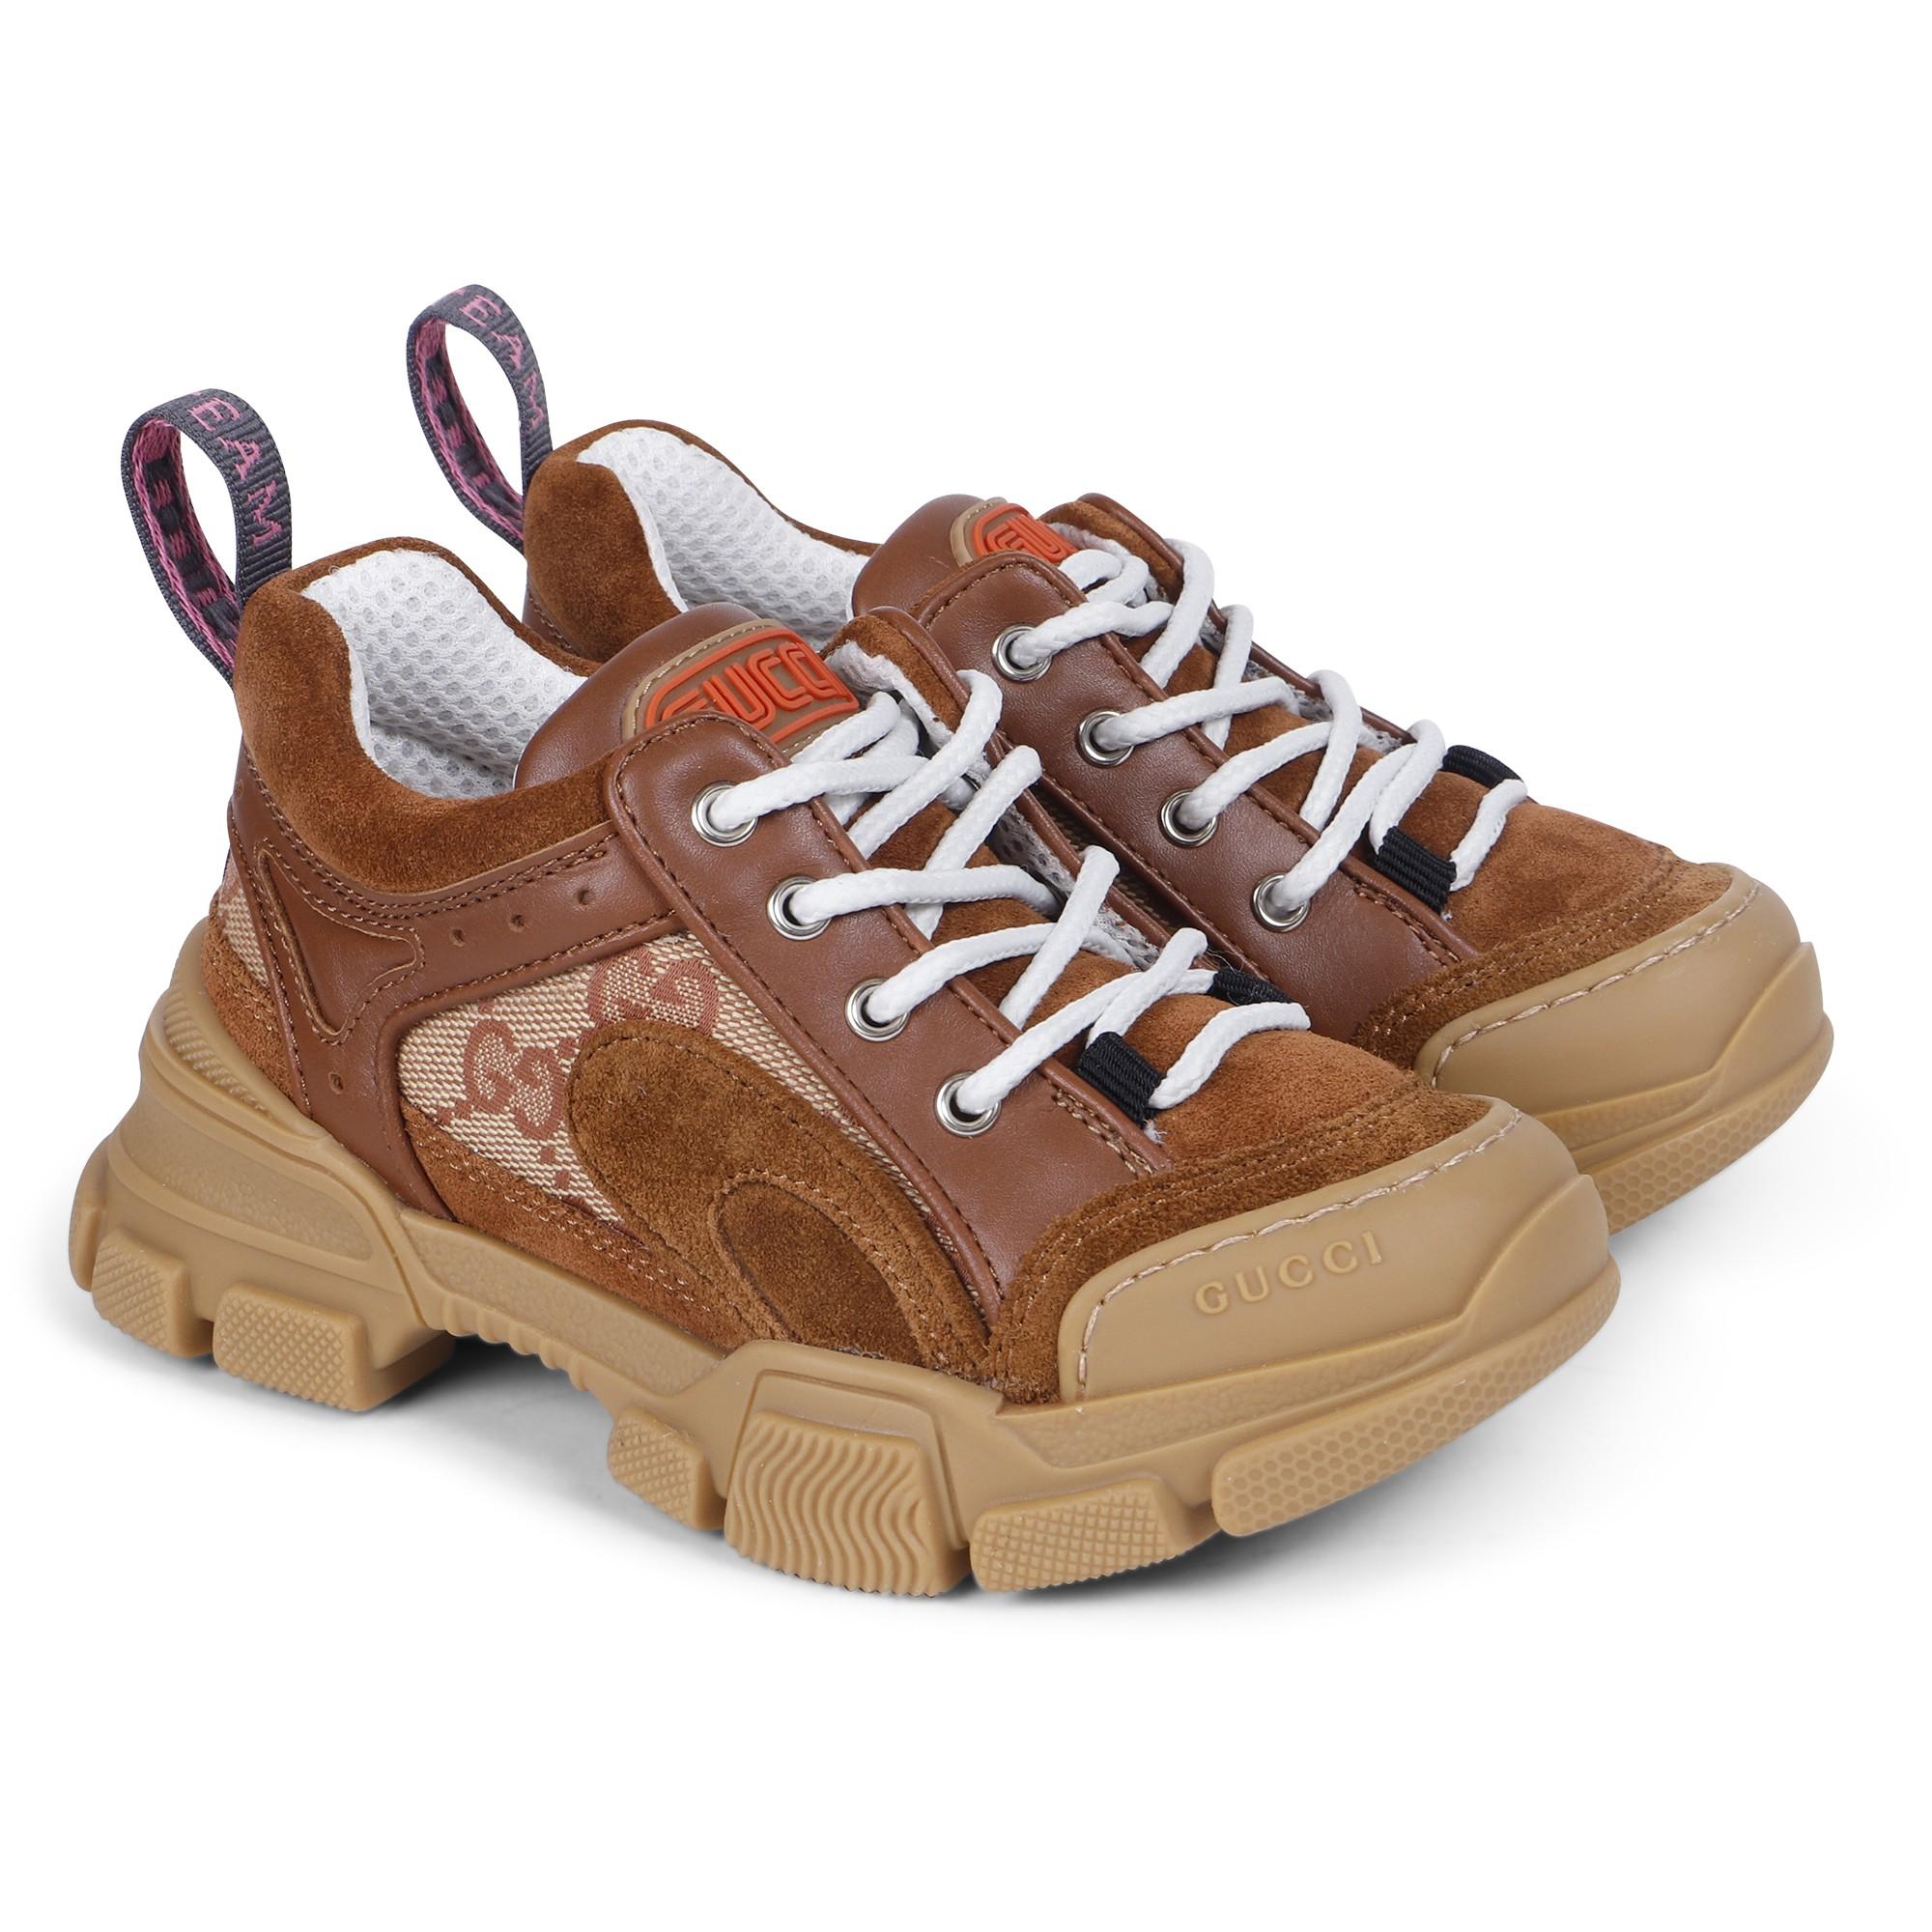 Gucci Flashtrek Sneakers in Brown